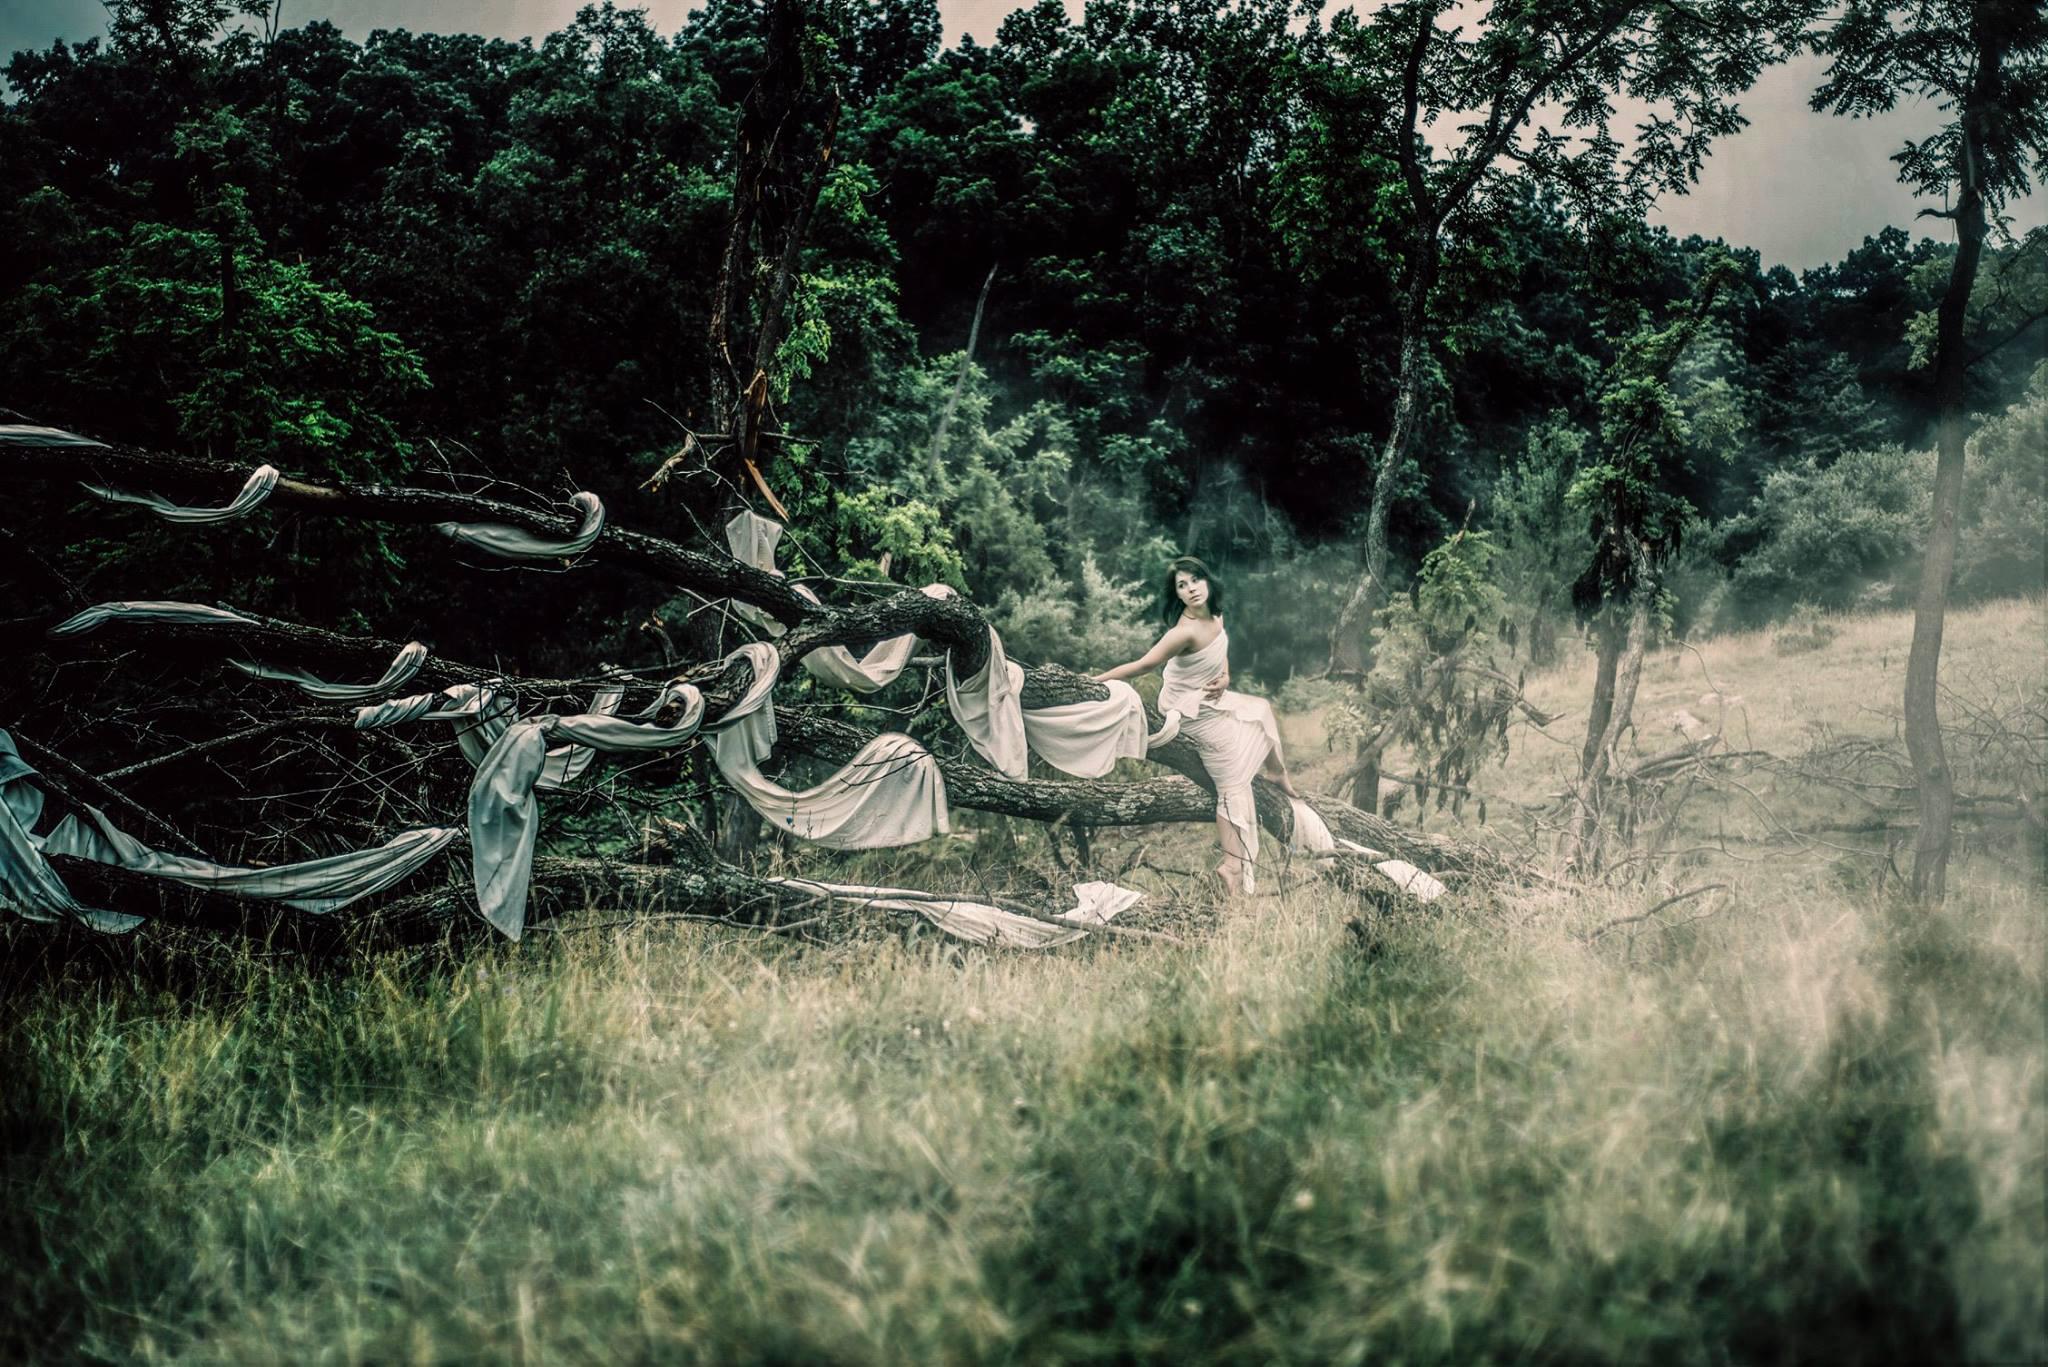 Gabrielle Van Wyck White Sails Creative Self Portraits Personal Work Fine Art Photography_8.JPG